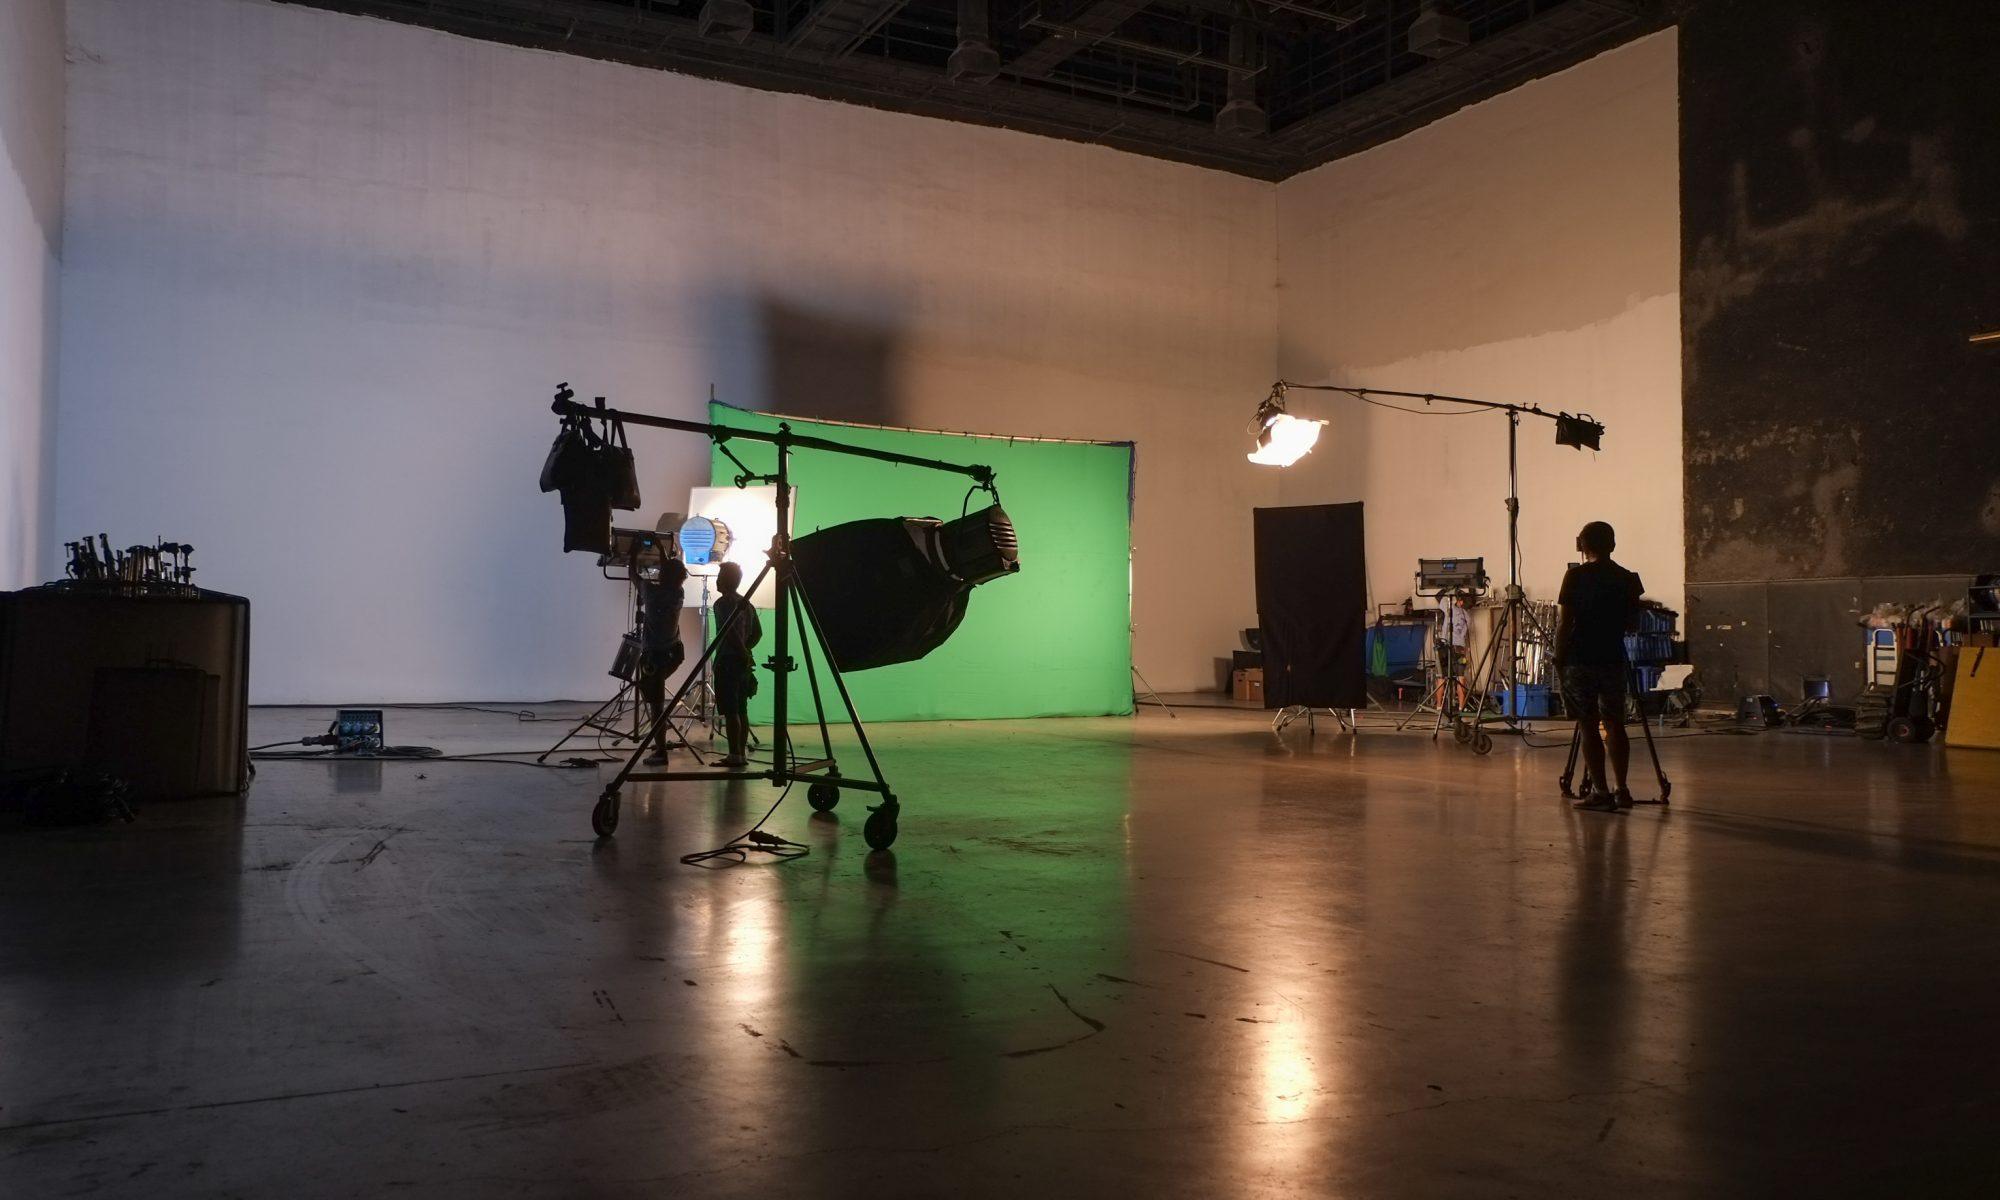 JFDI Studios